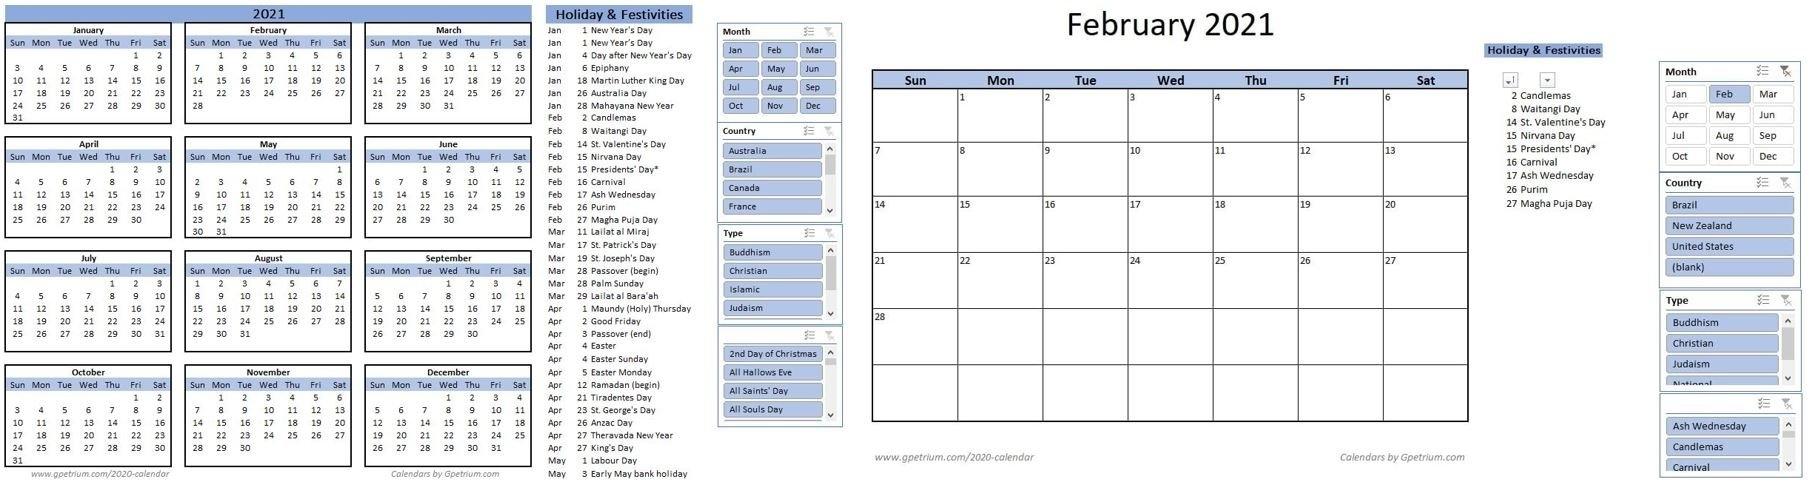 Get Blank Monthly Calendar Template Excel 2021